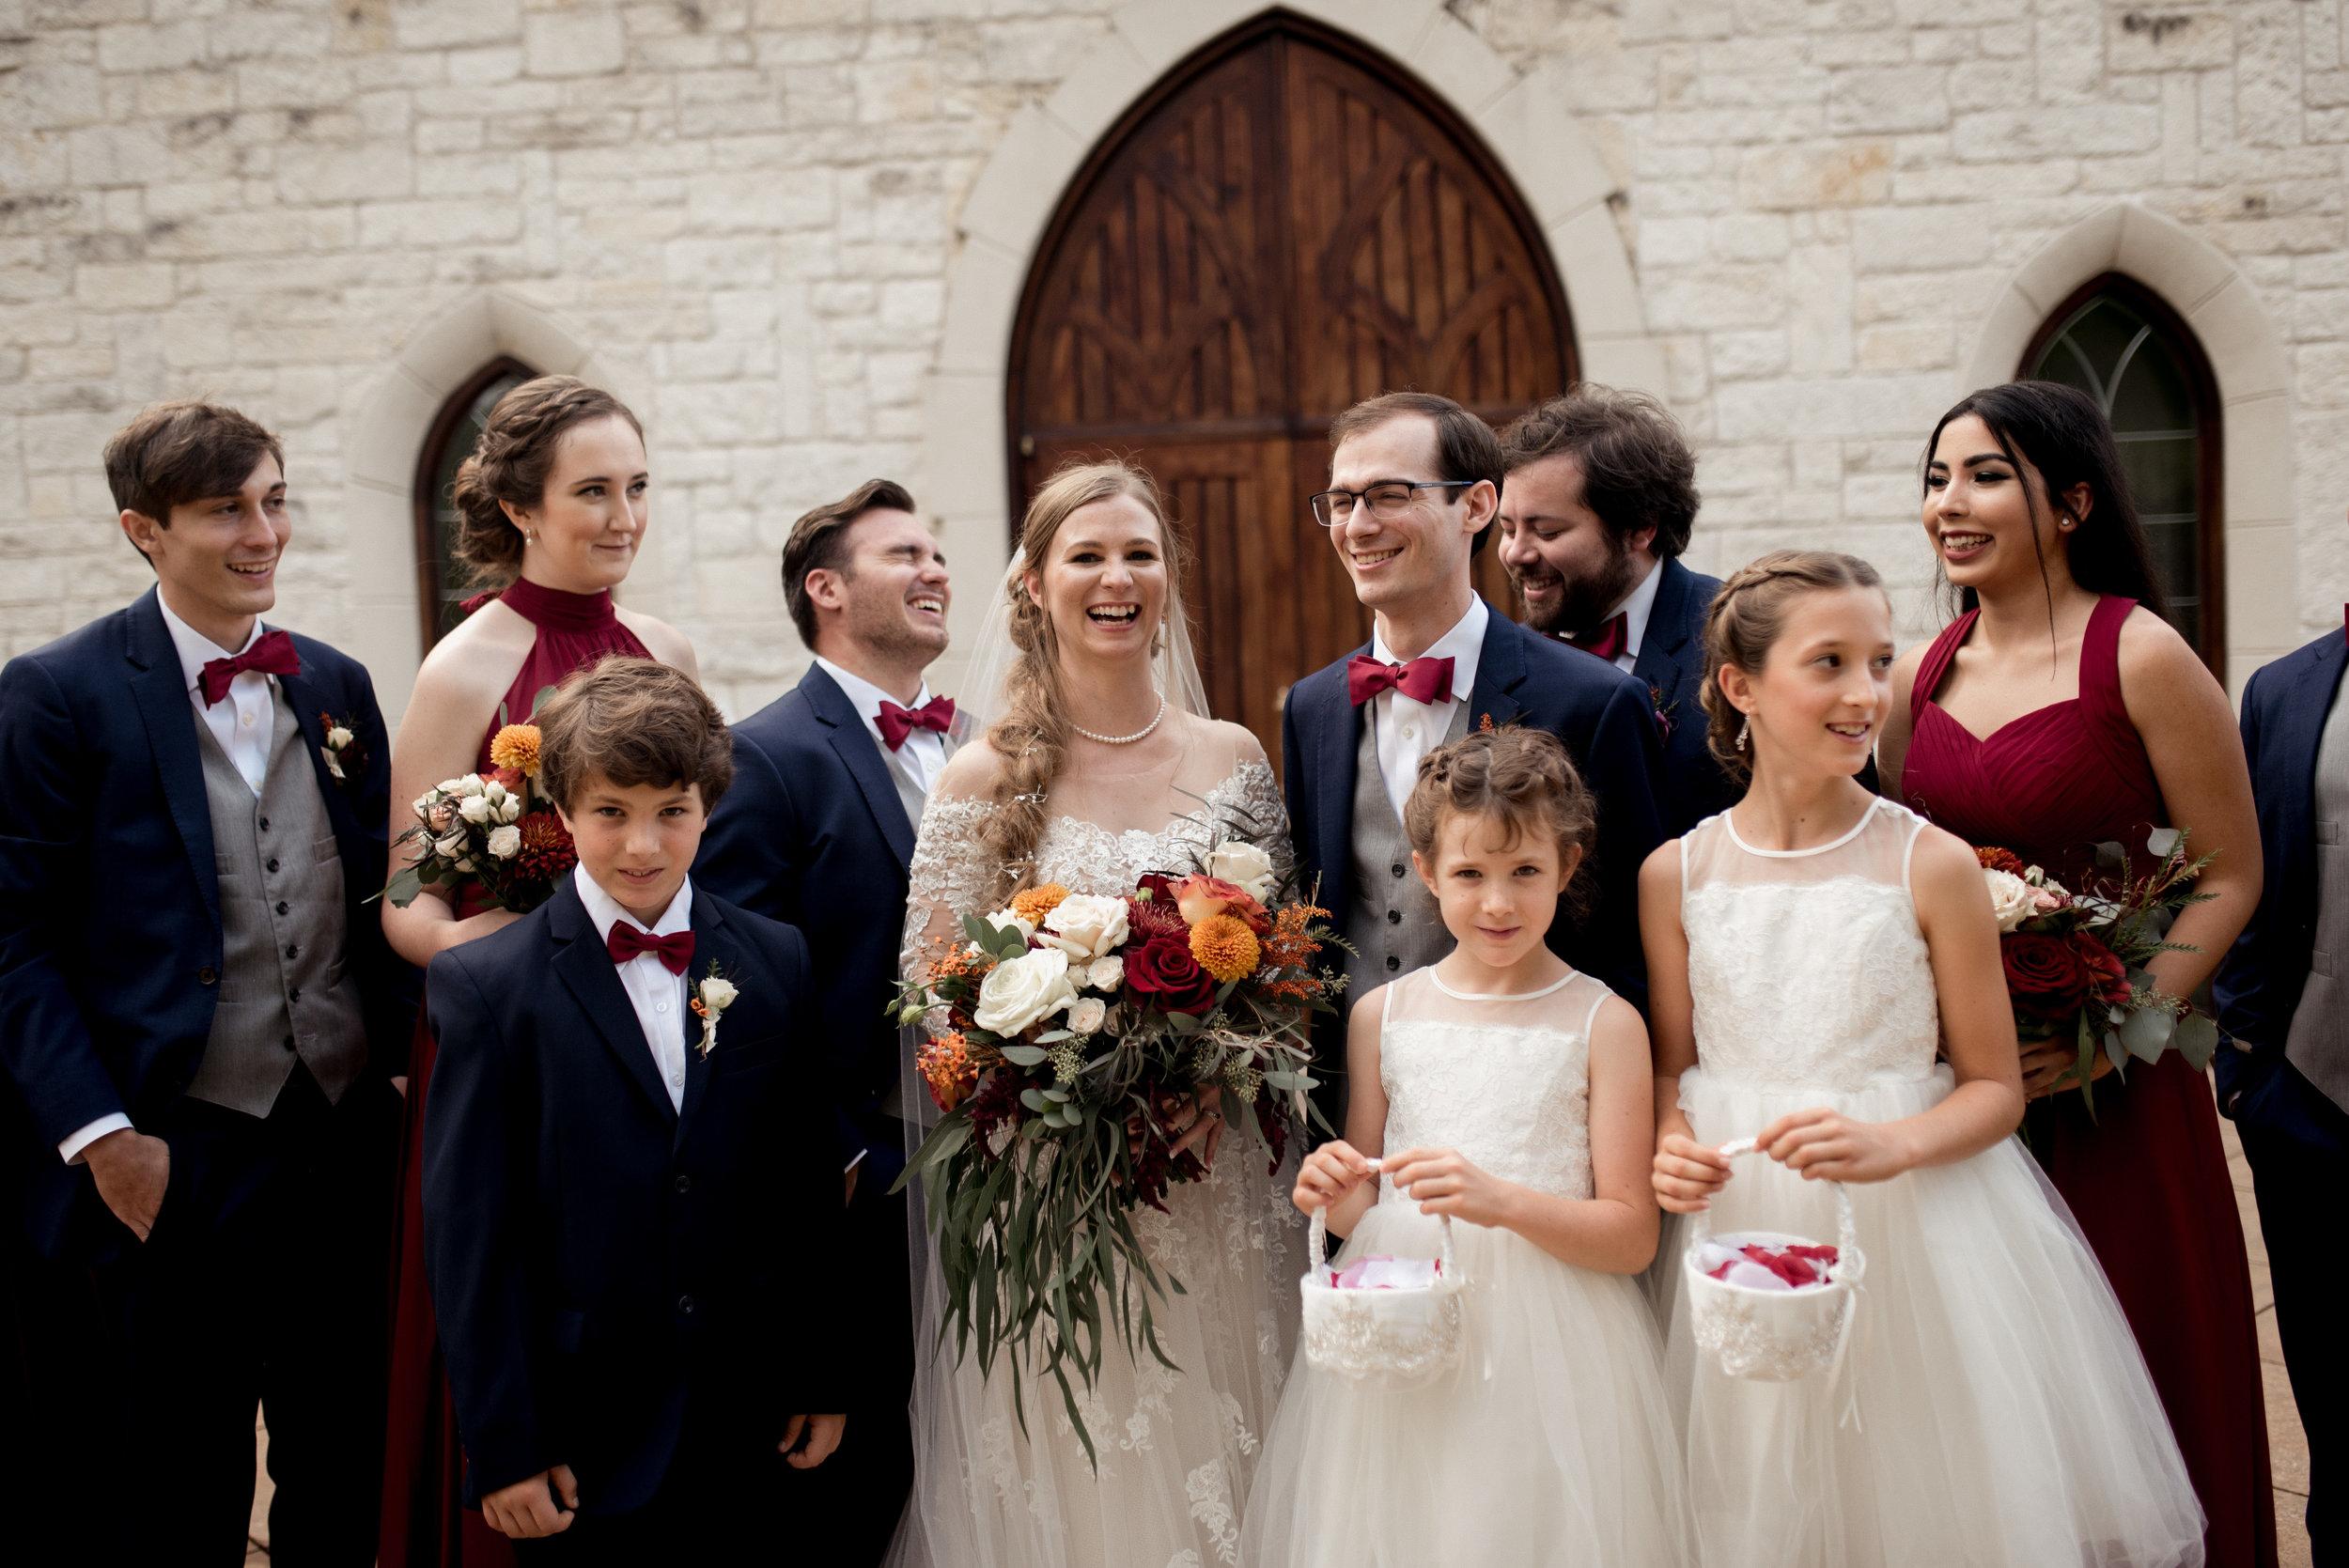 Artigues Wedding-270.jpg